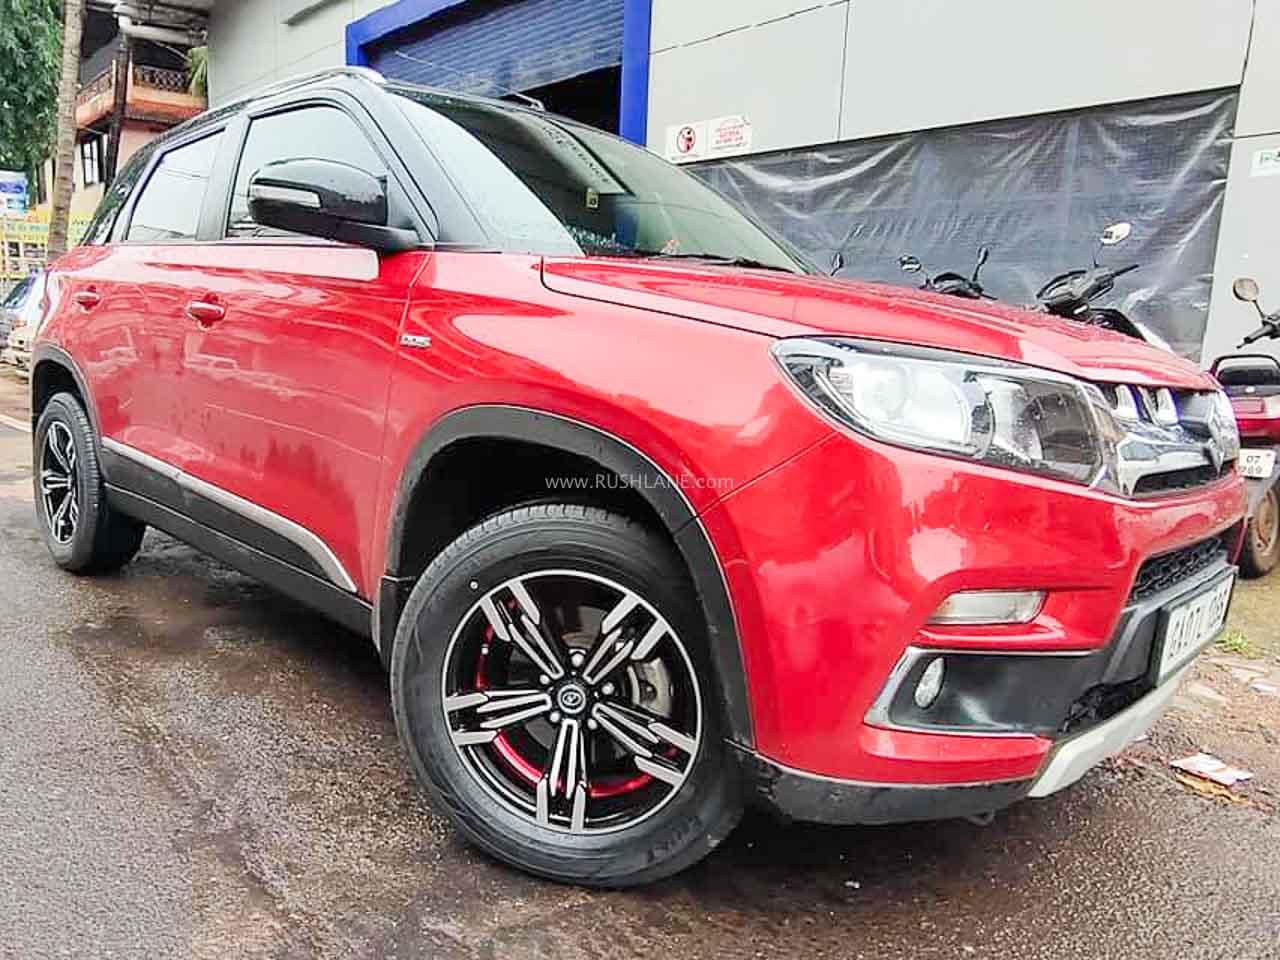 Maruti Brezza owner modifies his SUV look – Thanks to stylish new alloys